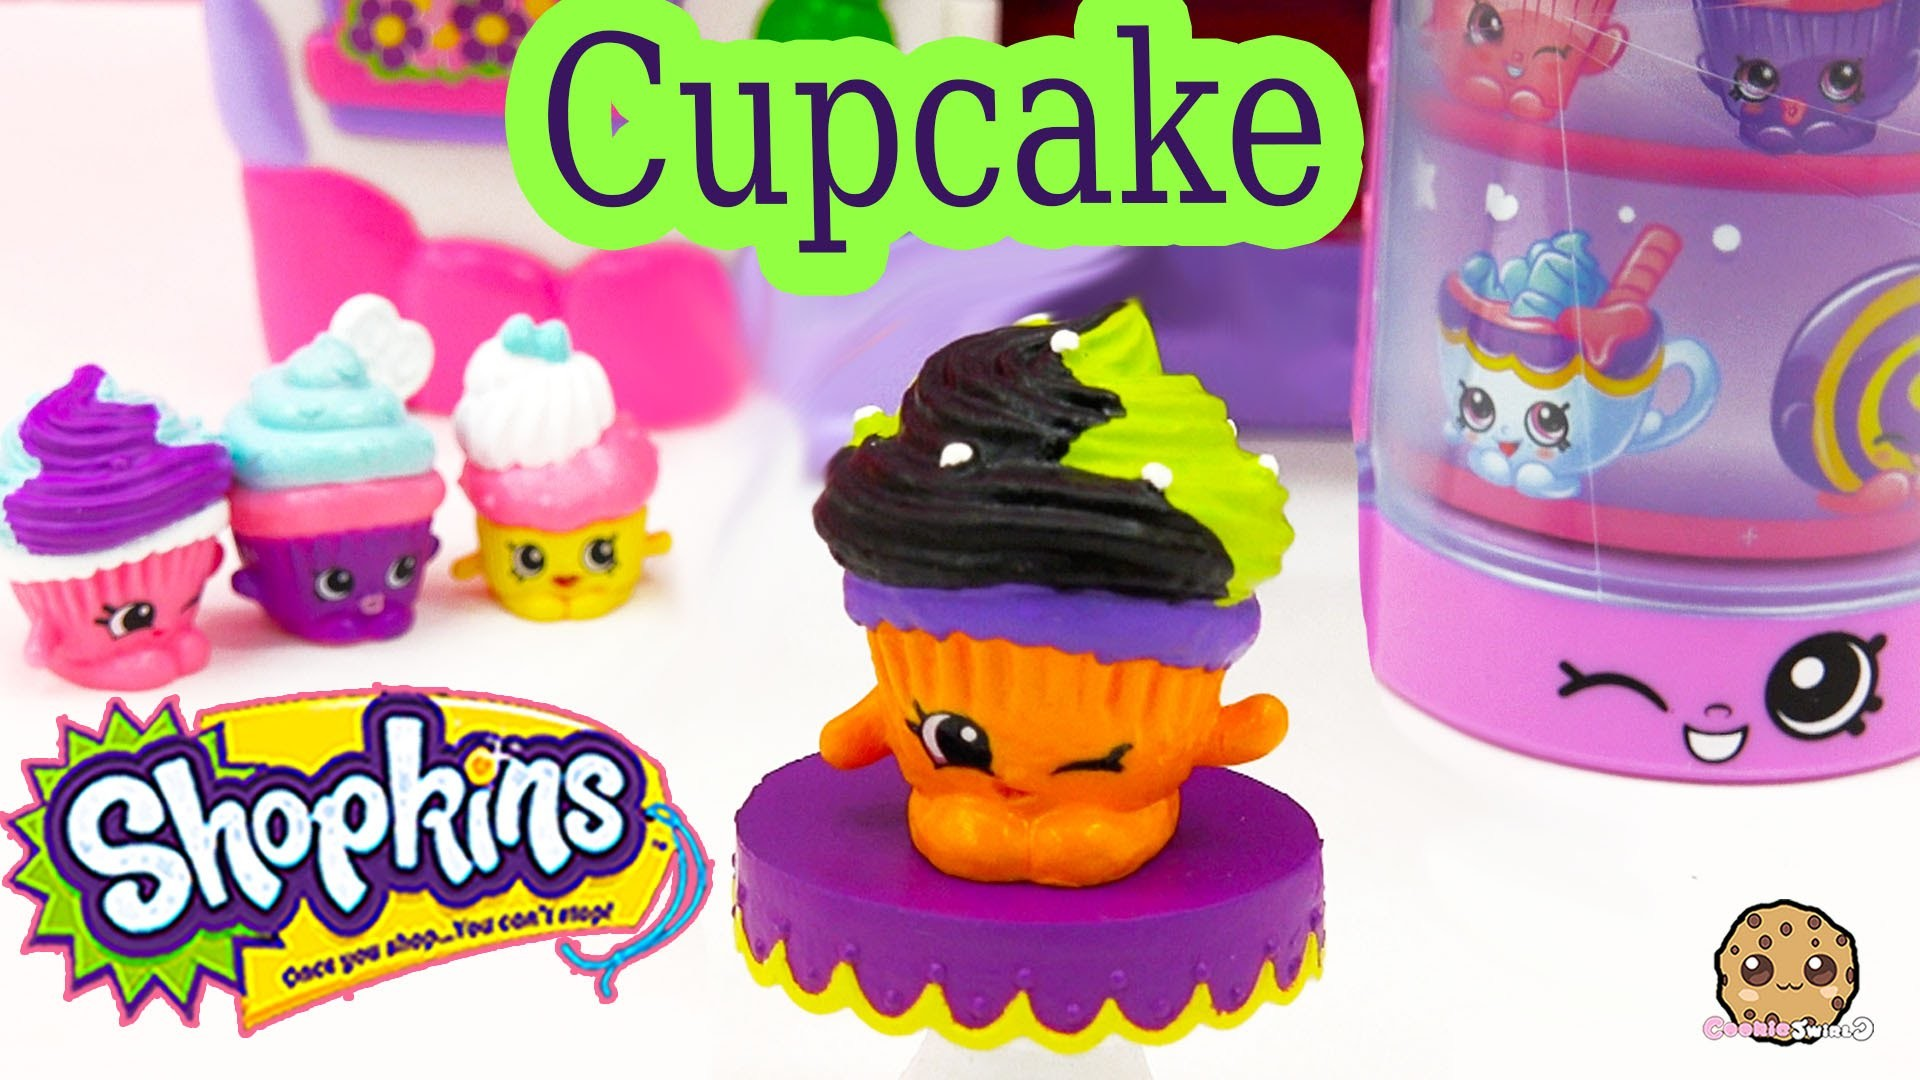 DIY Shopkins Season 3 Custom Exclusive Cupcake Halloween Inspired Painted  Craft Toy Cookieswirlc – YouTube